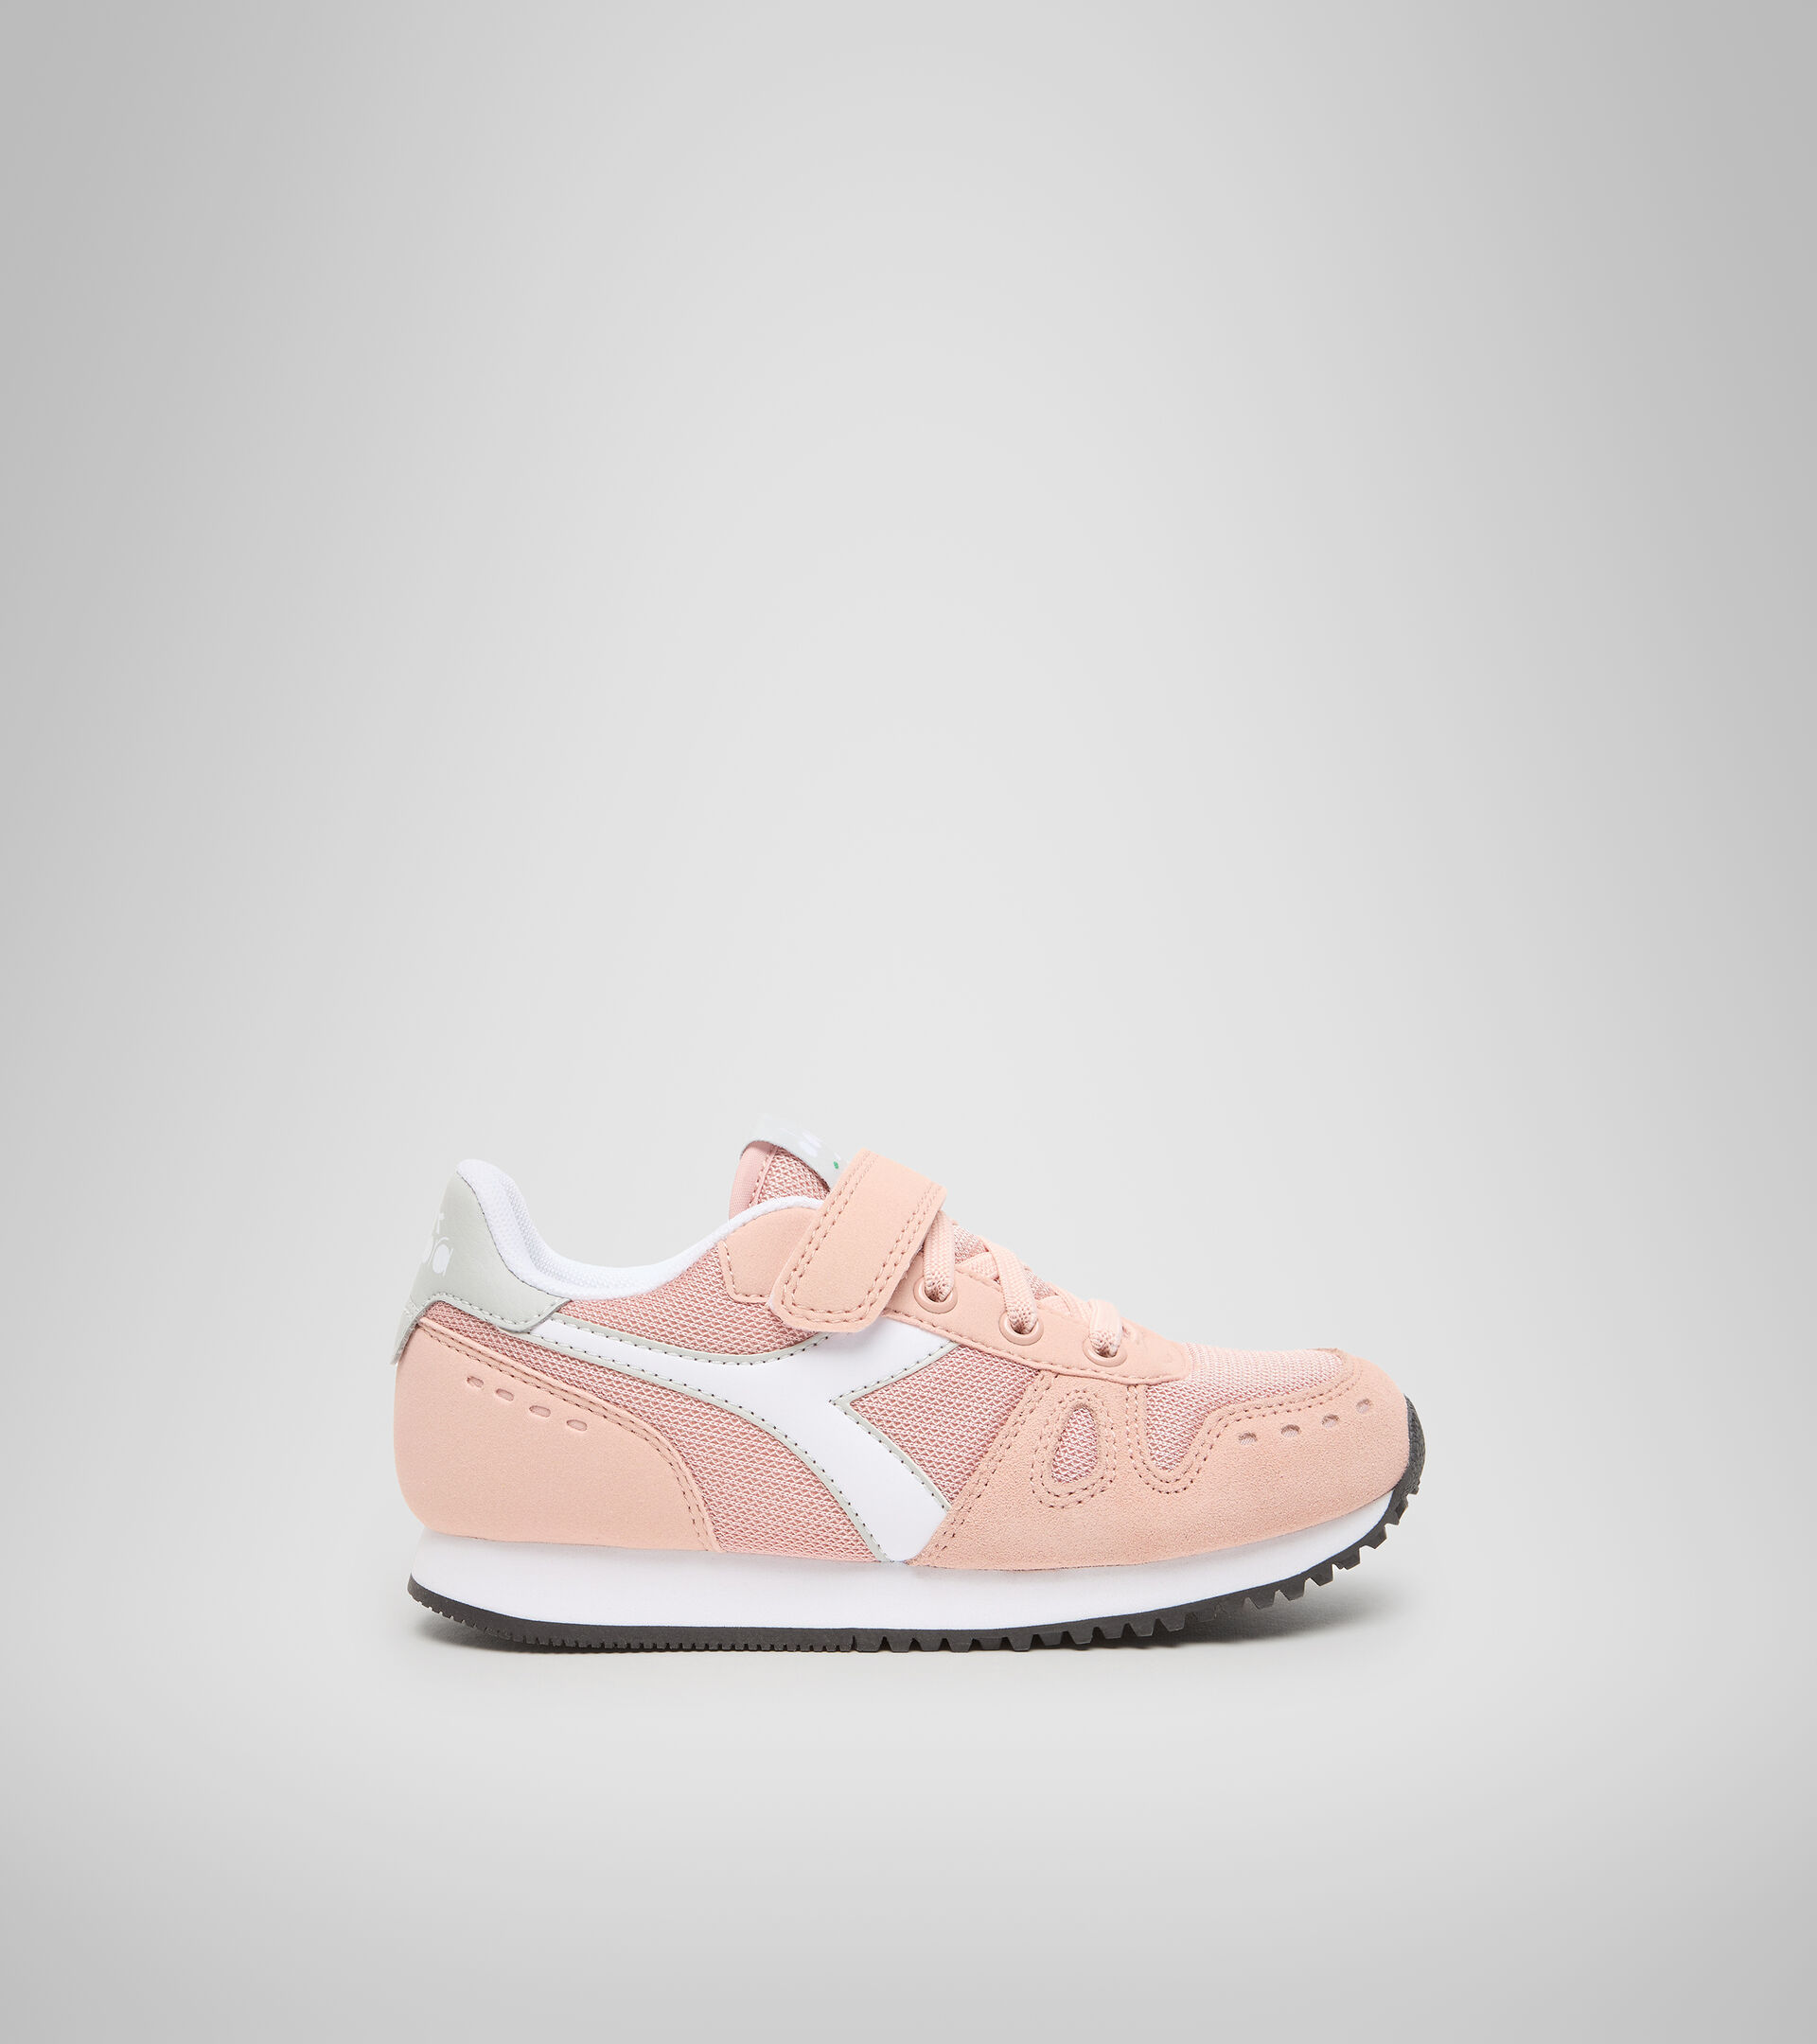 Footwear Sport BAMBINO SIMPLE RUN PS SOL DE NOCHE Diadora